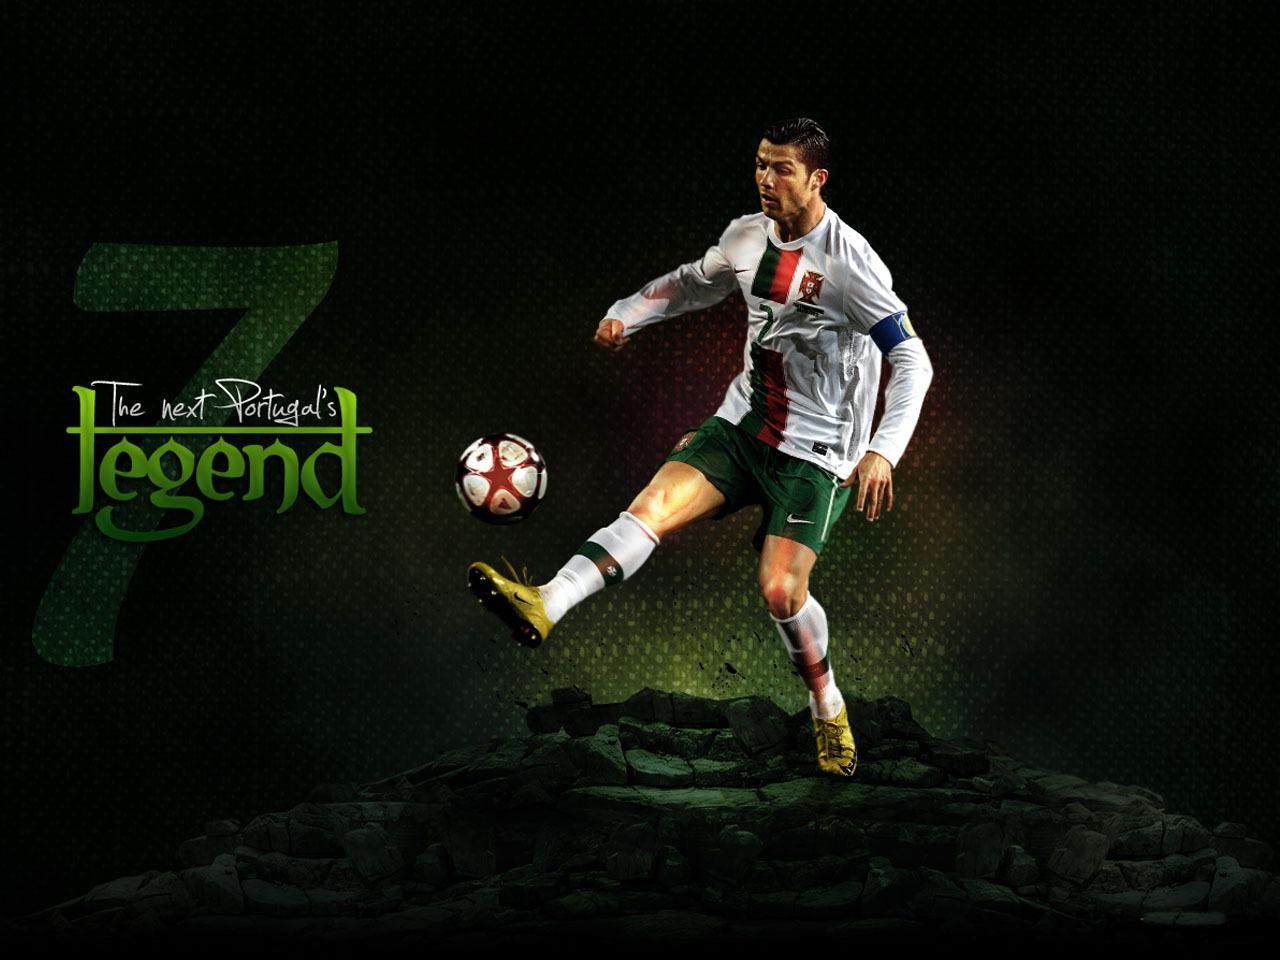 Cristiano Ronaldo New HD Wallpapers 2012-2013